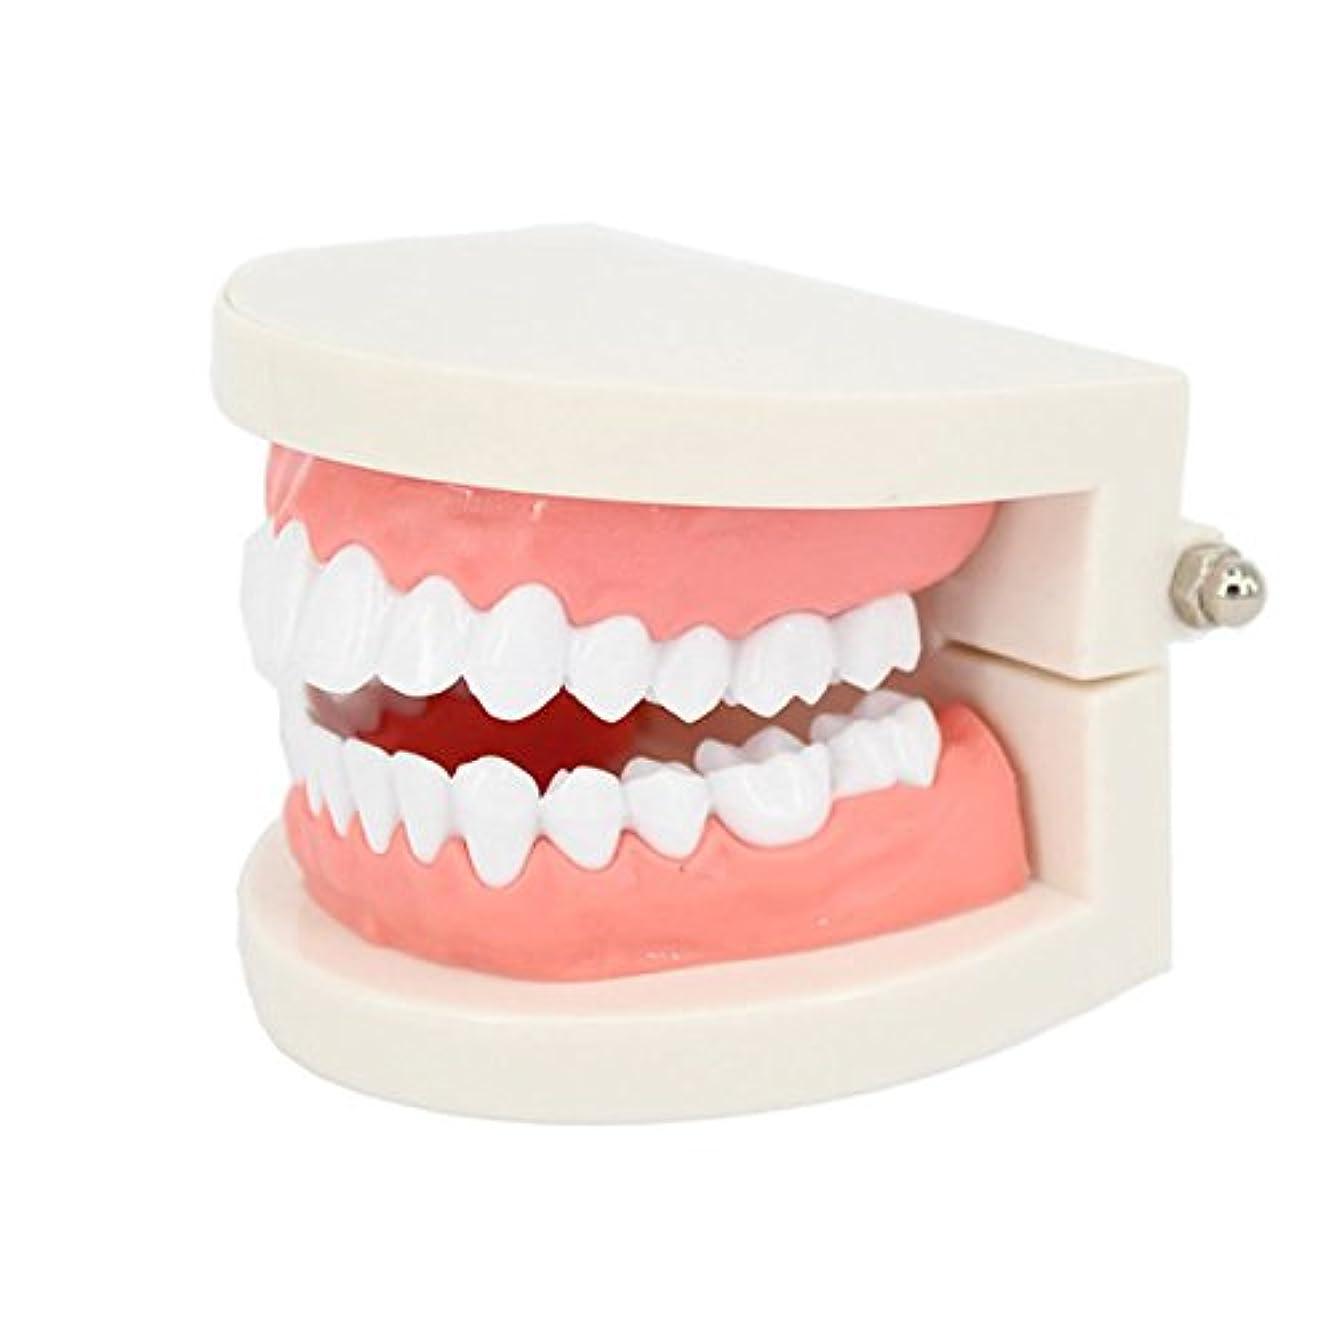 ペルー隣接オーブンROSENICE 歯科医 歯列模型 歯は着脱可能 指導用模型